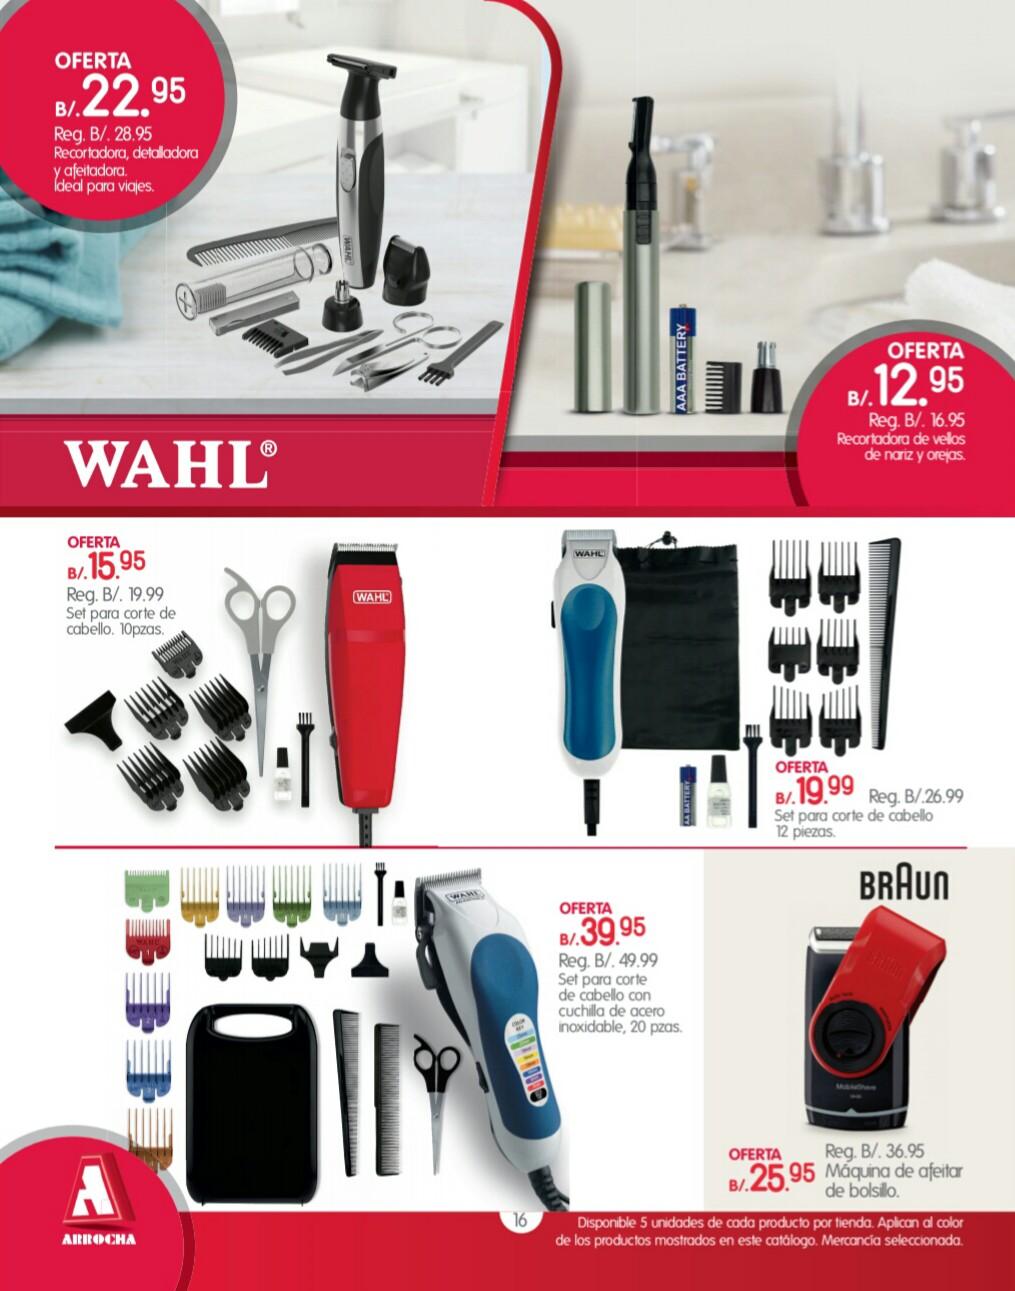 Catalogo de ofertas Arrocha -septiembre 2018 p16